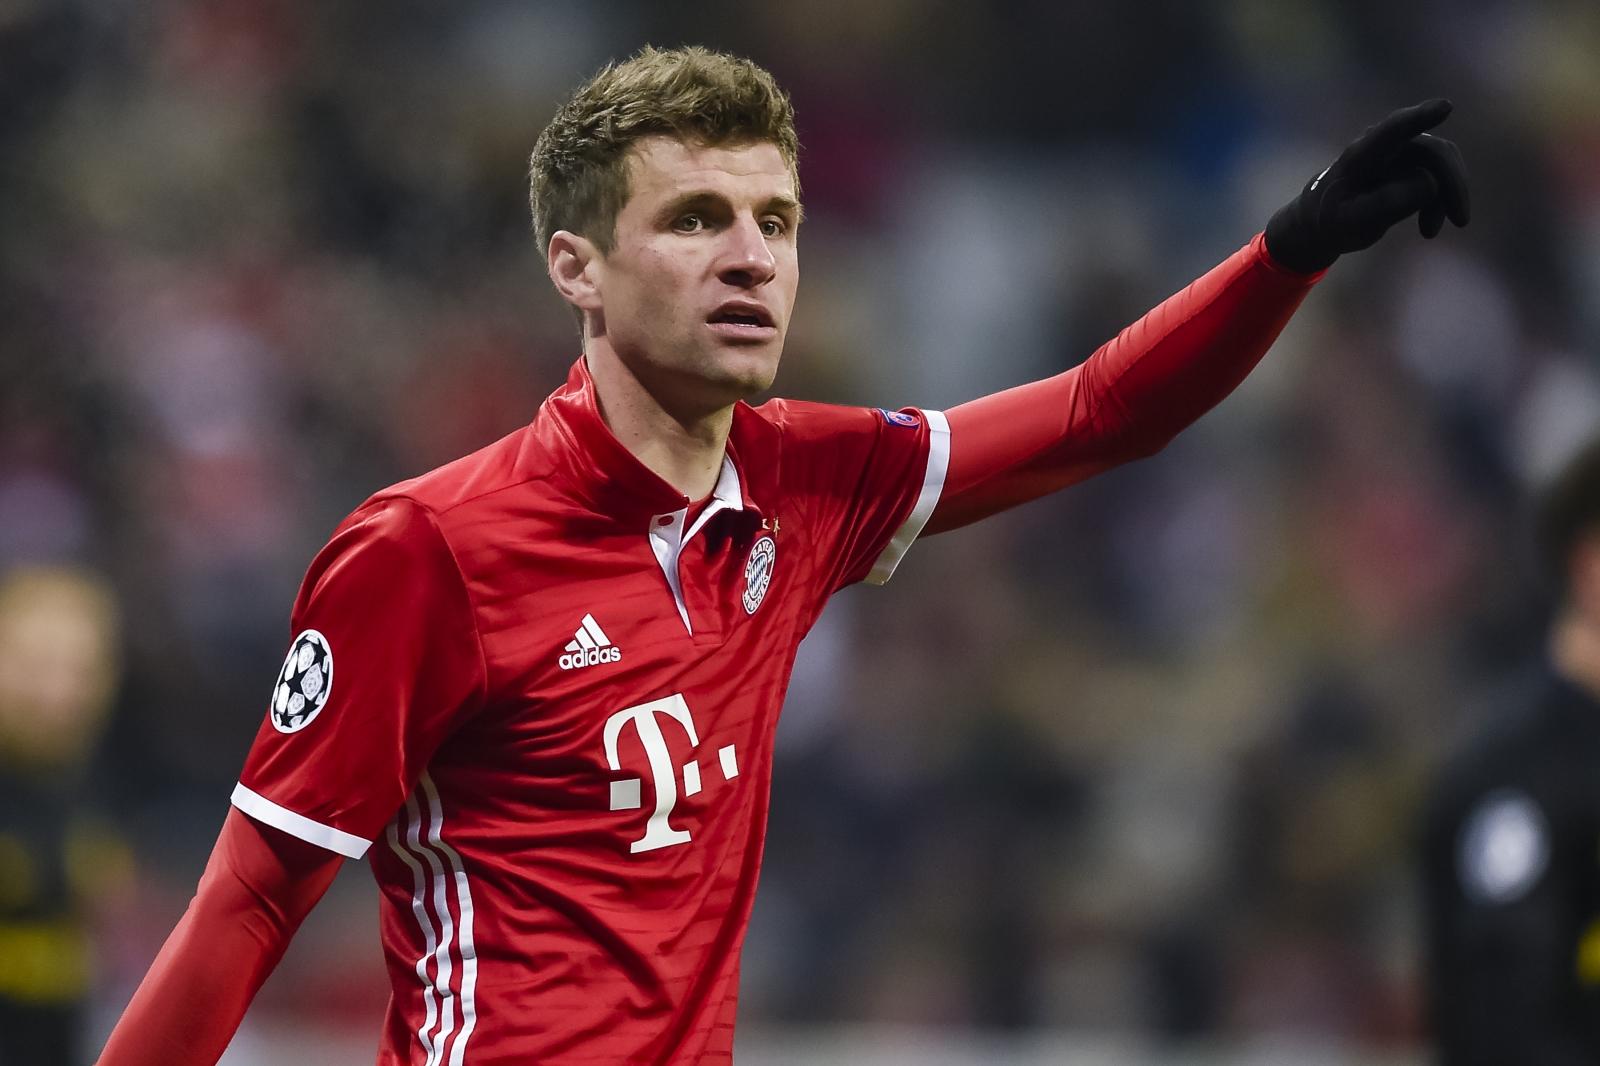 Bayern reveal Manchester United bid £85m for forward Thomas Muller